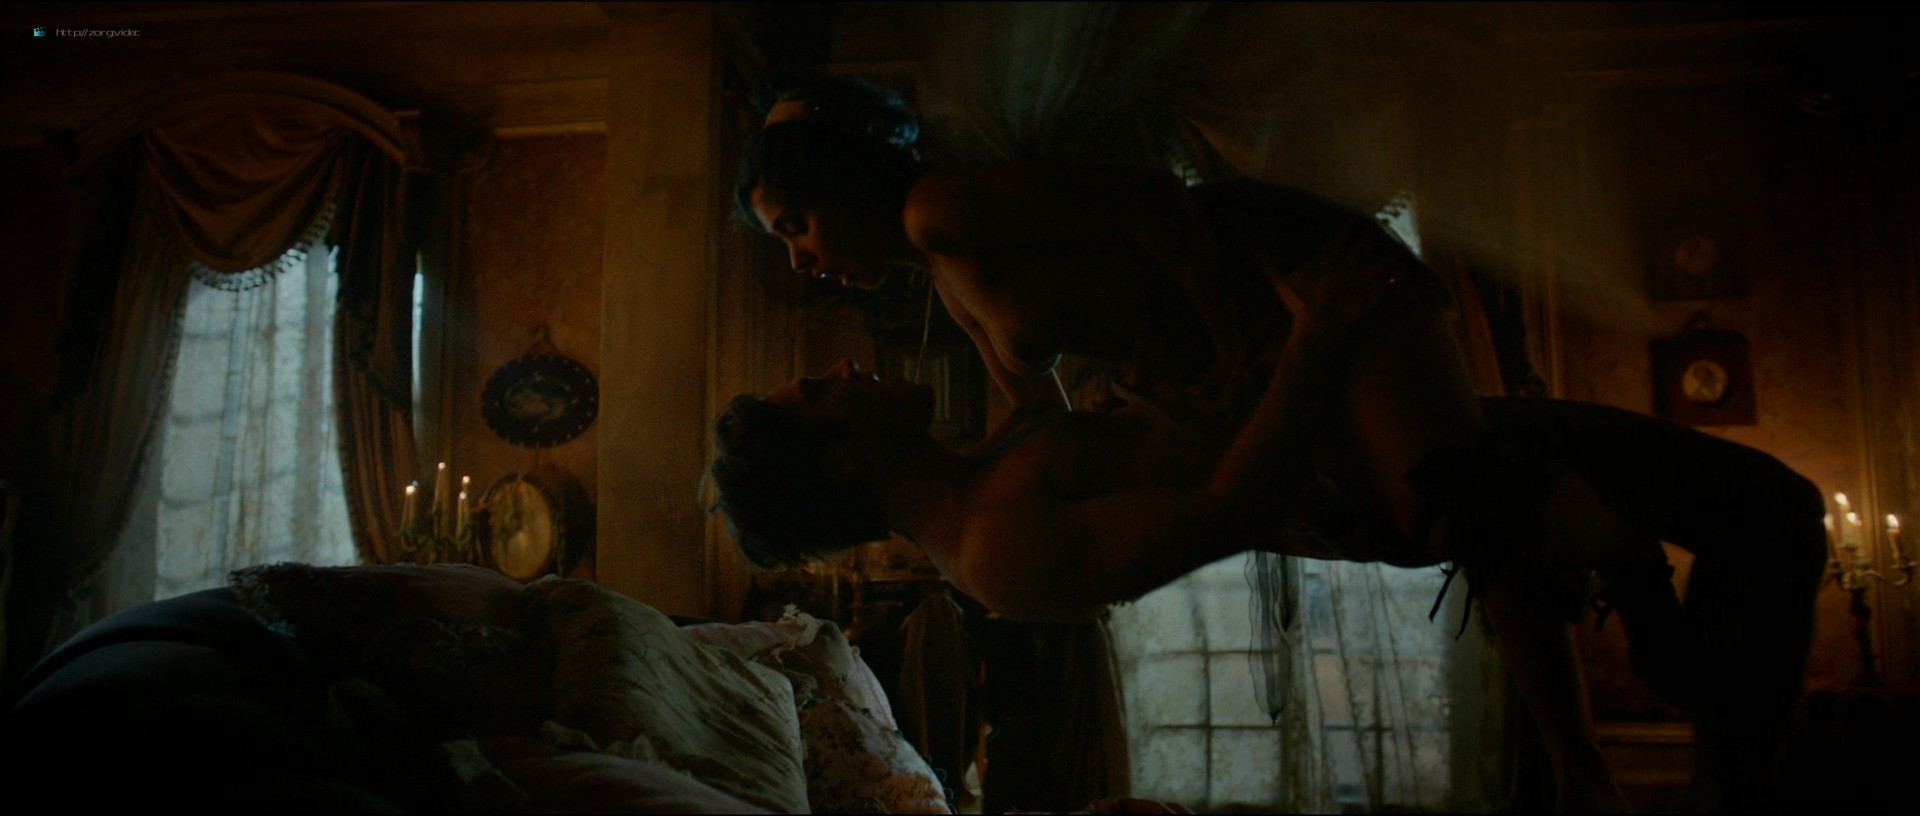 Maeve Dermody nude sex Karla Crome nude too - Carnival Row (2019) s1e1 HD 1080p (6)